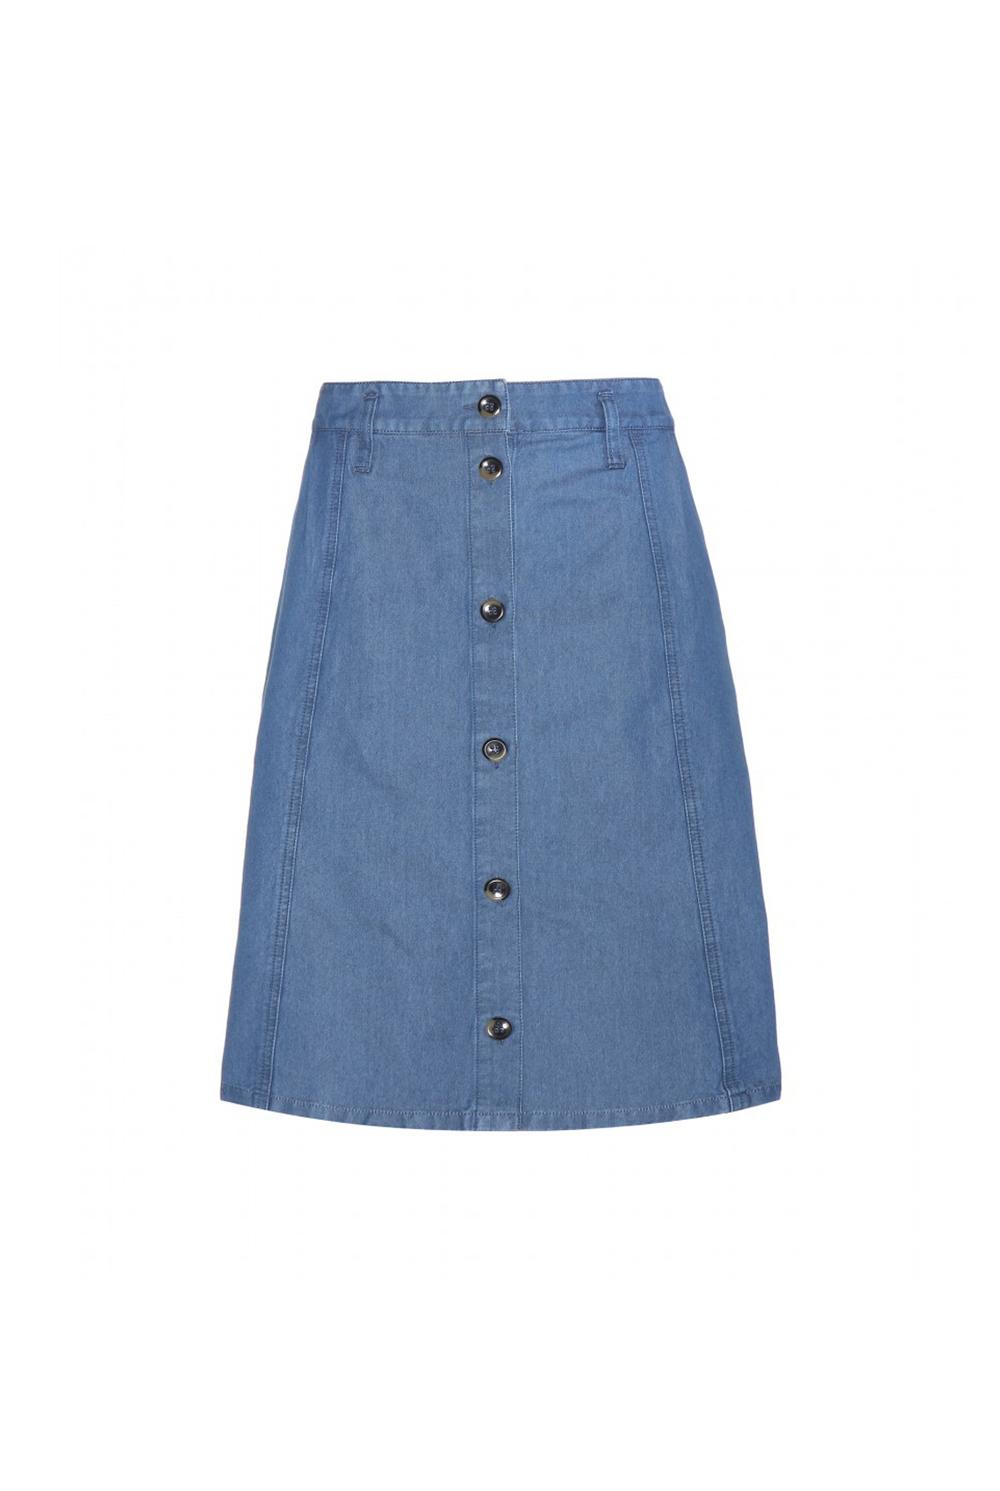 11-spring-denim-trends-button-down-skirt-01.jpg